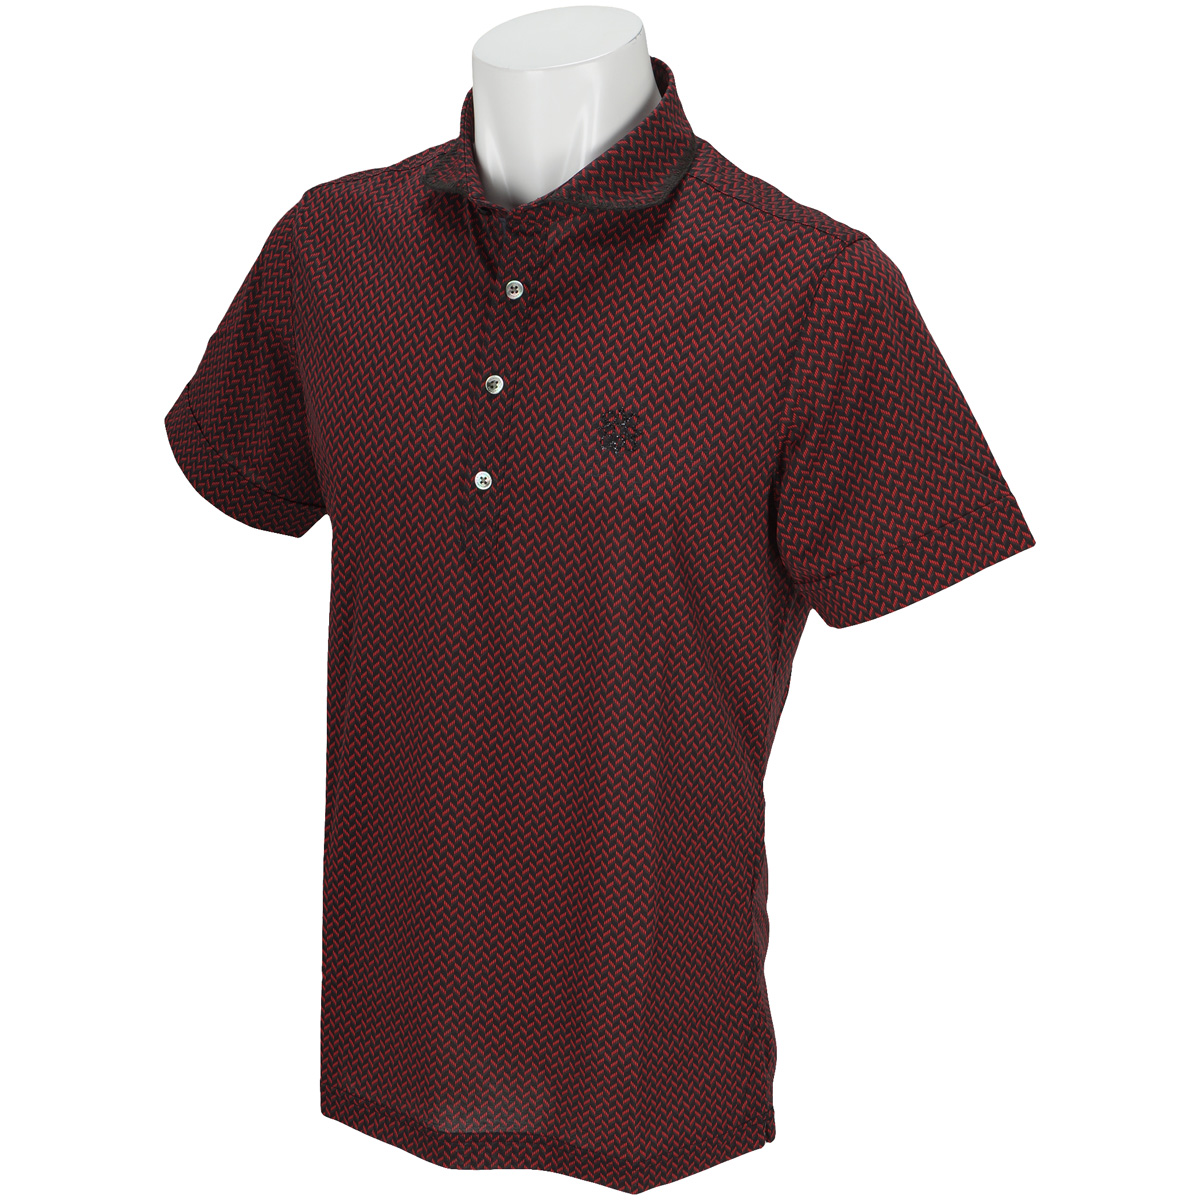 BlackLabel 半回縞幾何学柄ヘリンボーンプリント 半袖ポロシャツ